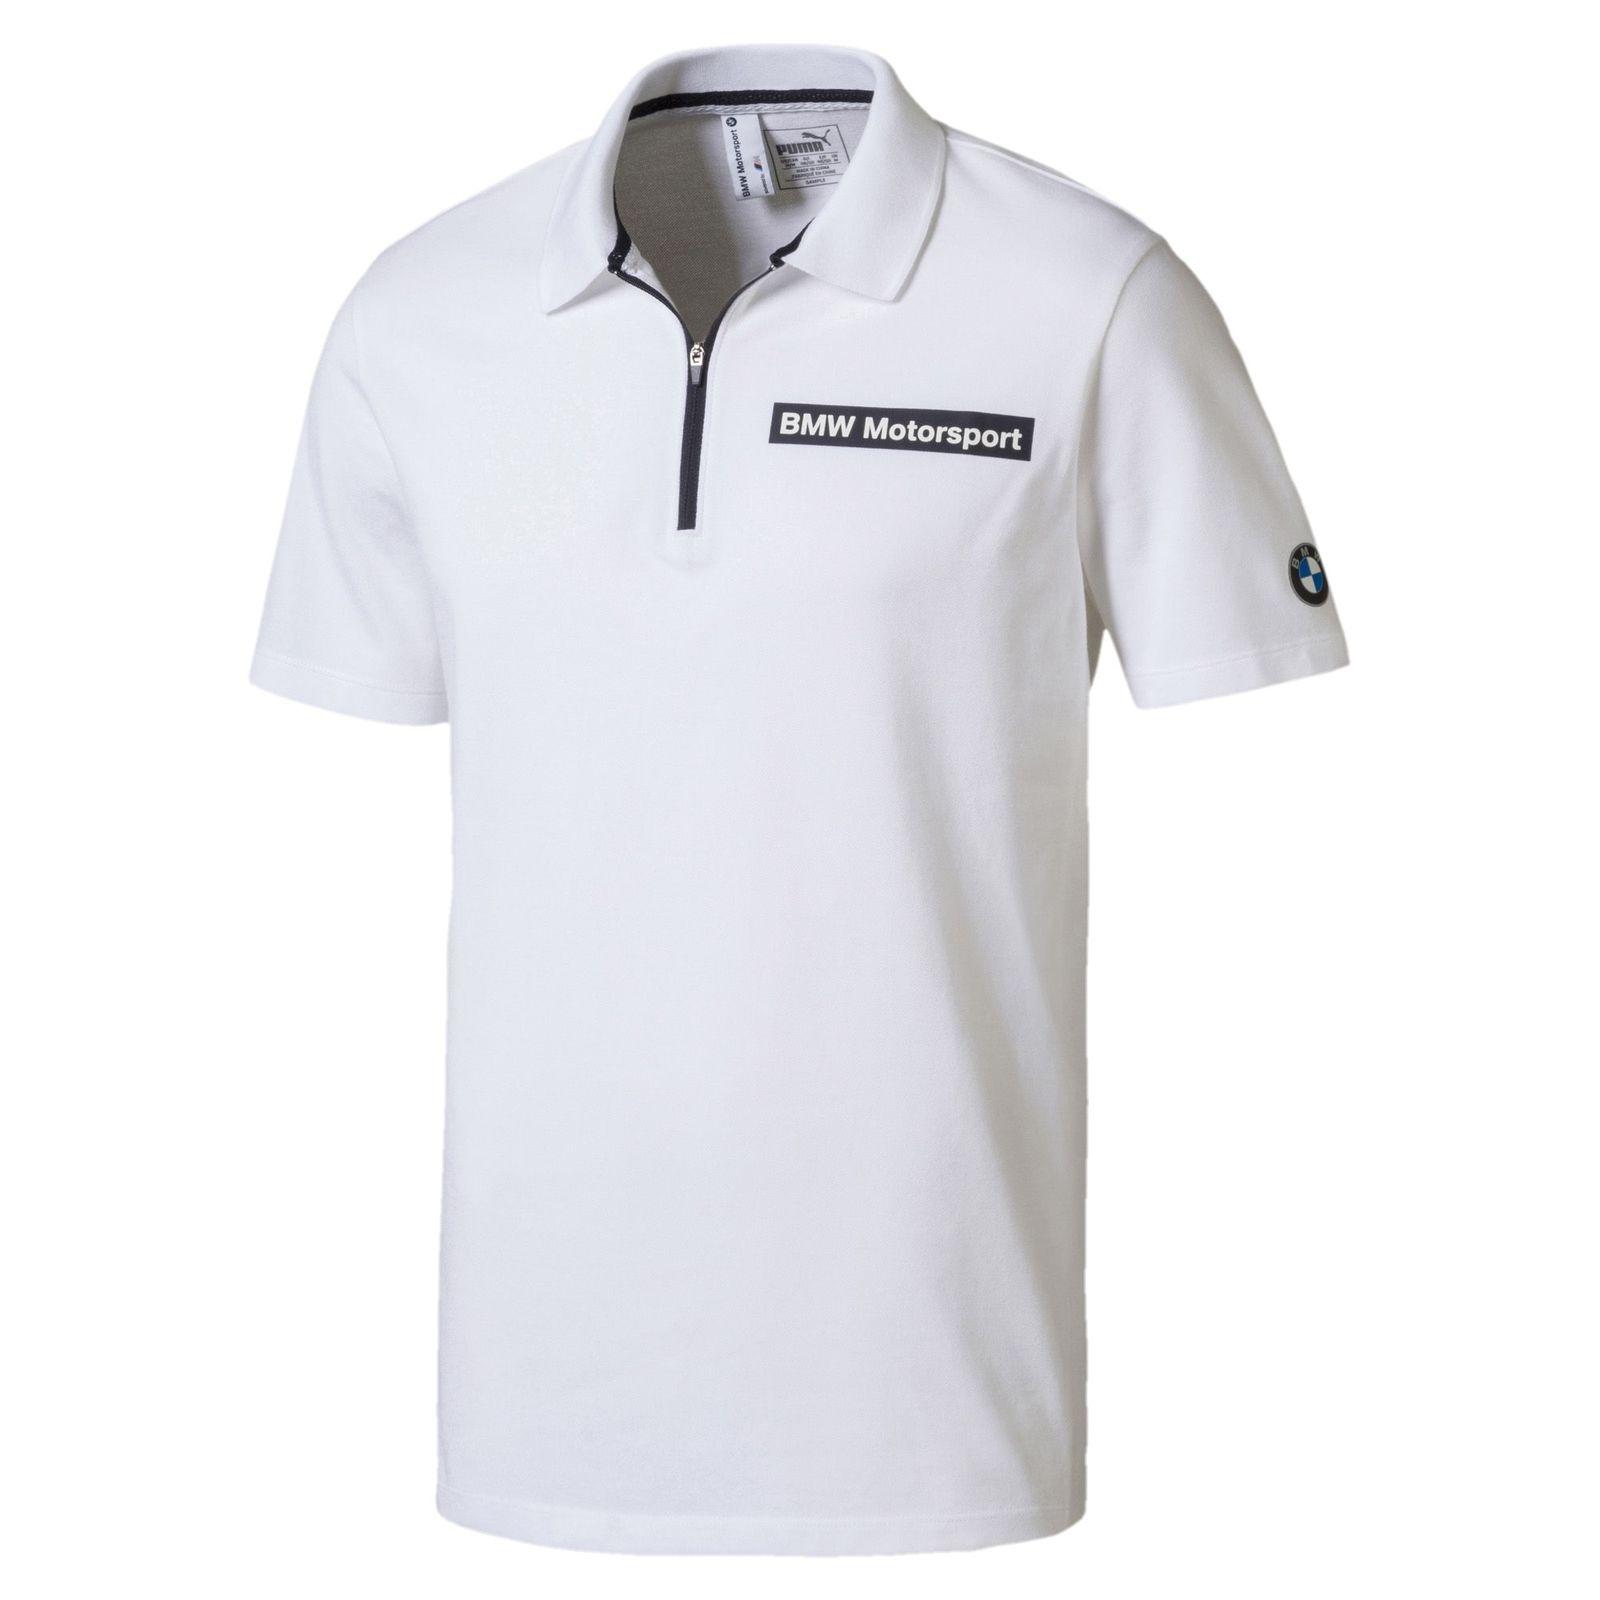 PUMA BMW Motorsport Men's Polo Shirt 2018-2019 - MyCarBoard.com